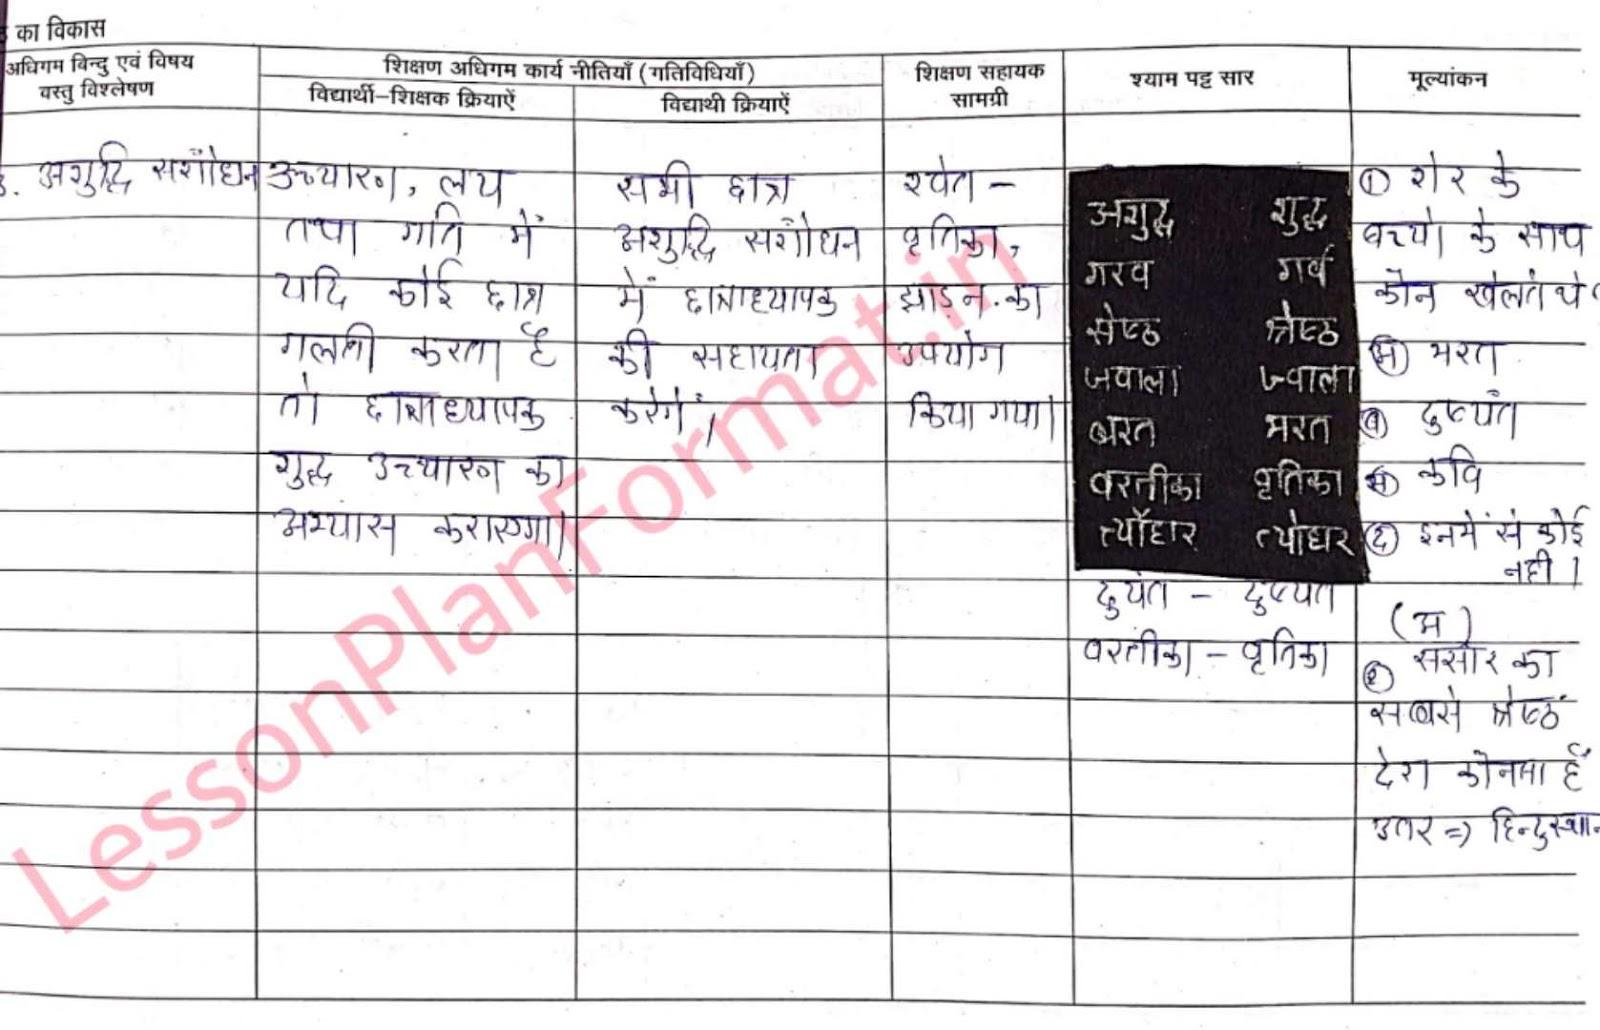 Class 5 Hindi Lesson Plan | B. Ed | D. El. Ed.